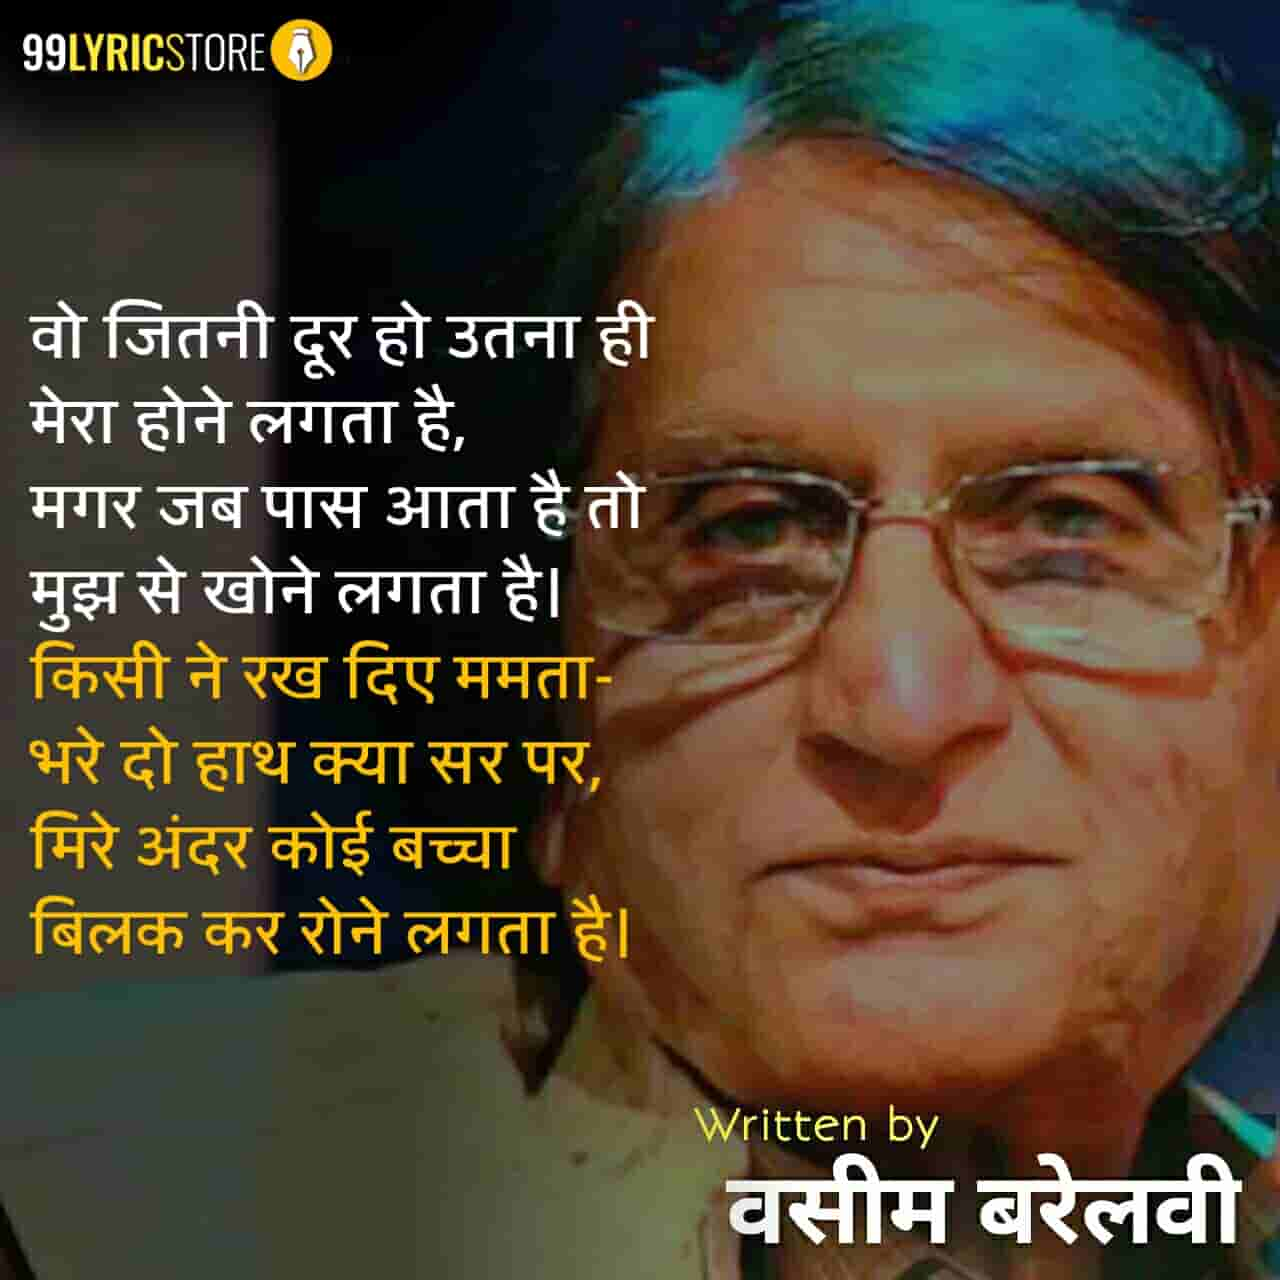 This beautiful ghazal 'Andhera Zehan Ka Samt-e-safar Jab Khone Lagata Hai' has written by Waseem Barelvi.